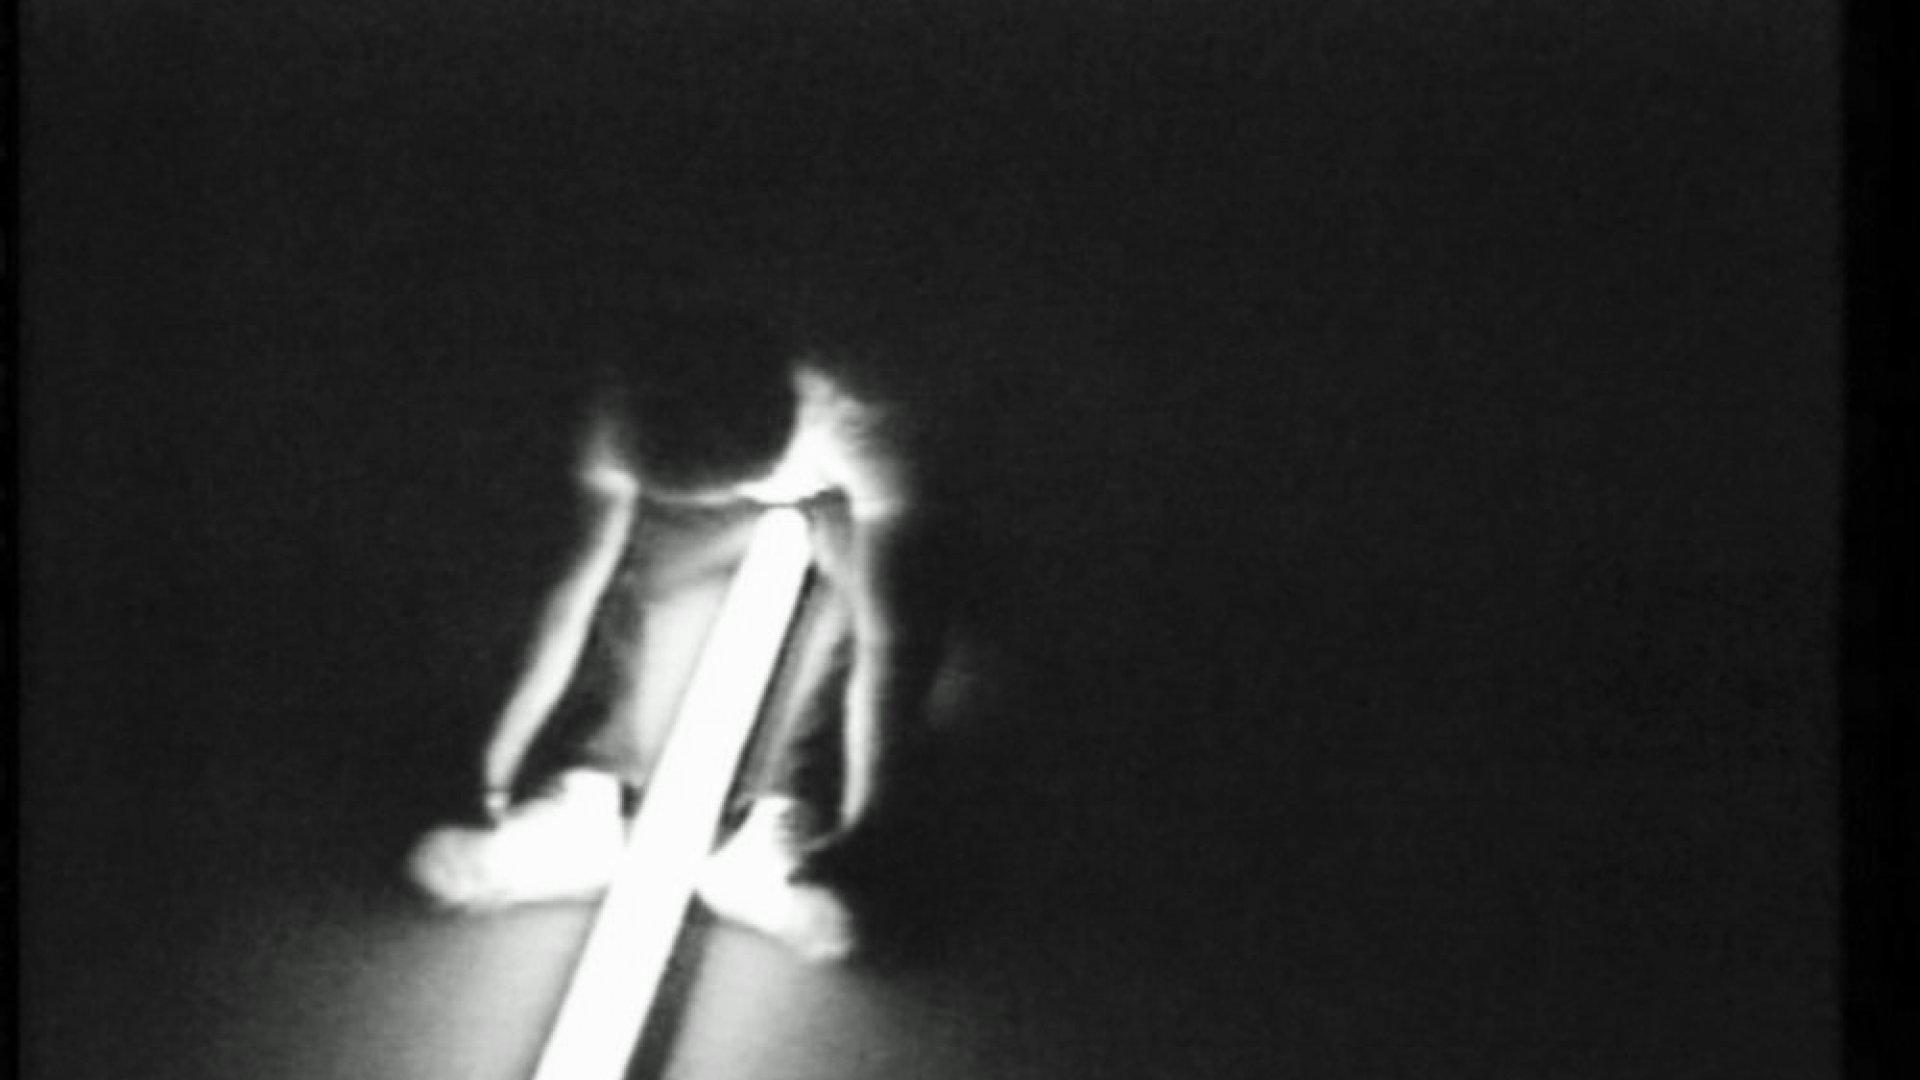 Manipulating A Fluorescent Tube Nauman Bruce Macba Museu D Art Contemporani De Barcelona